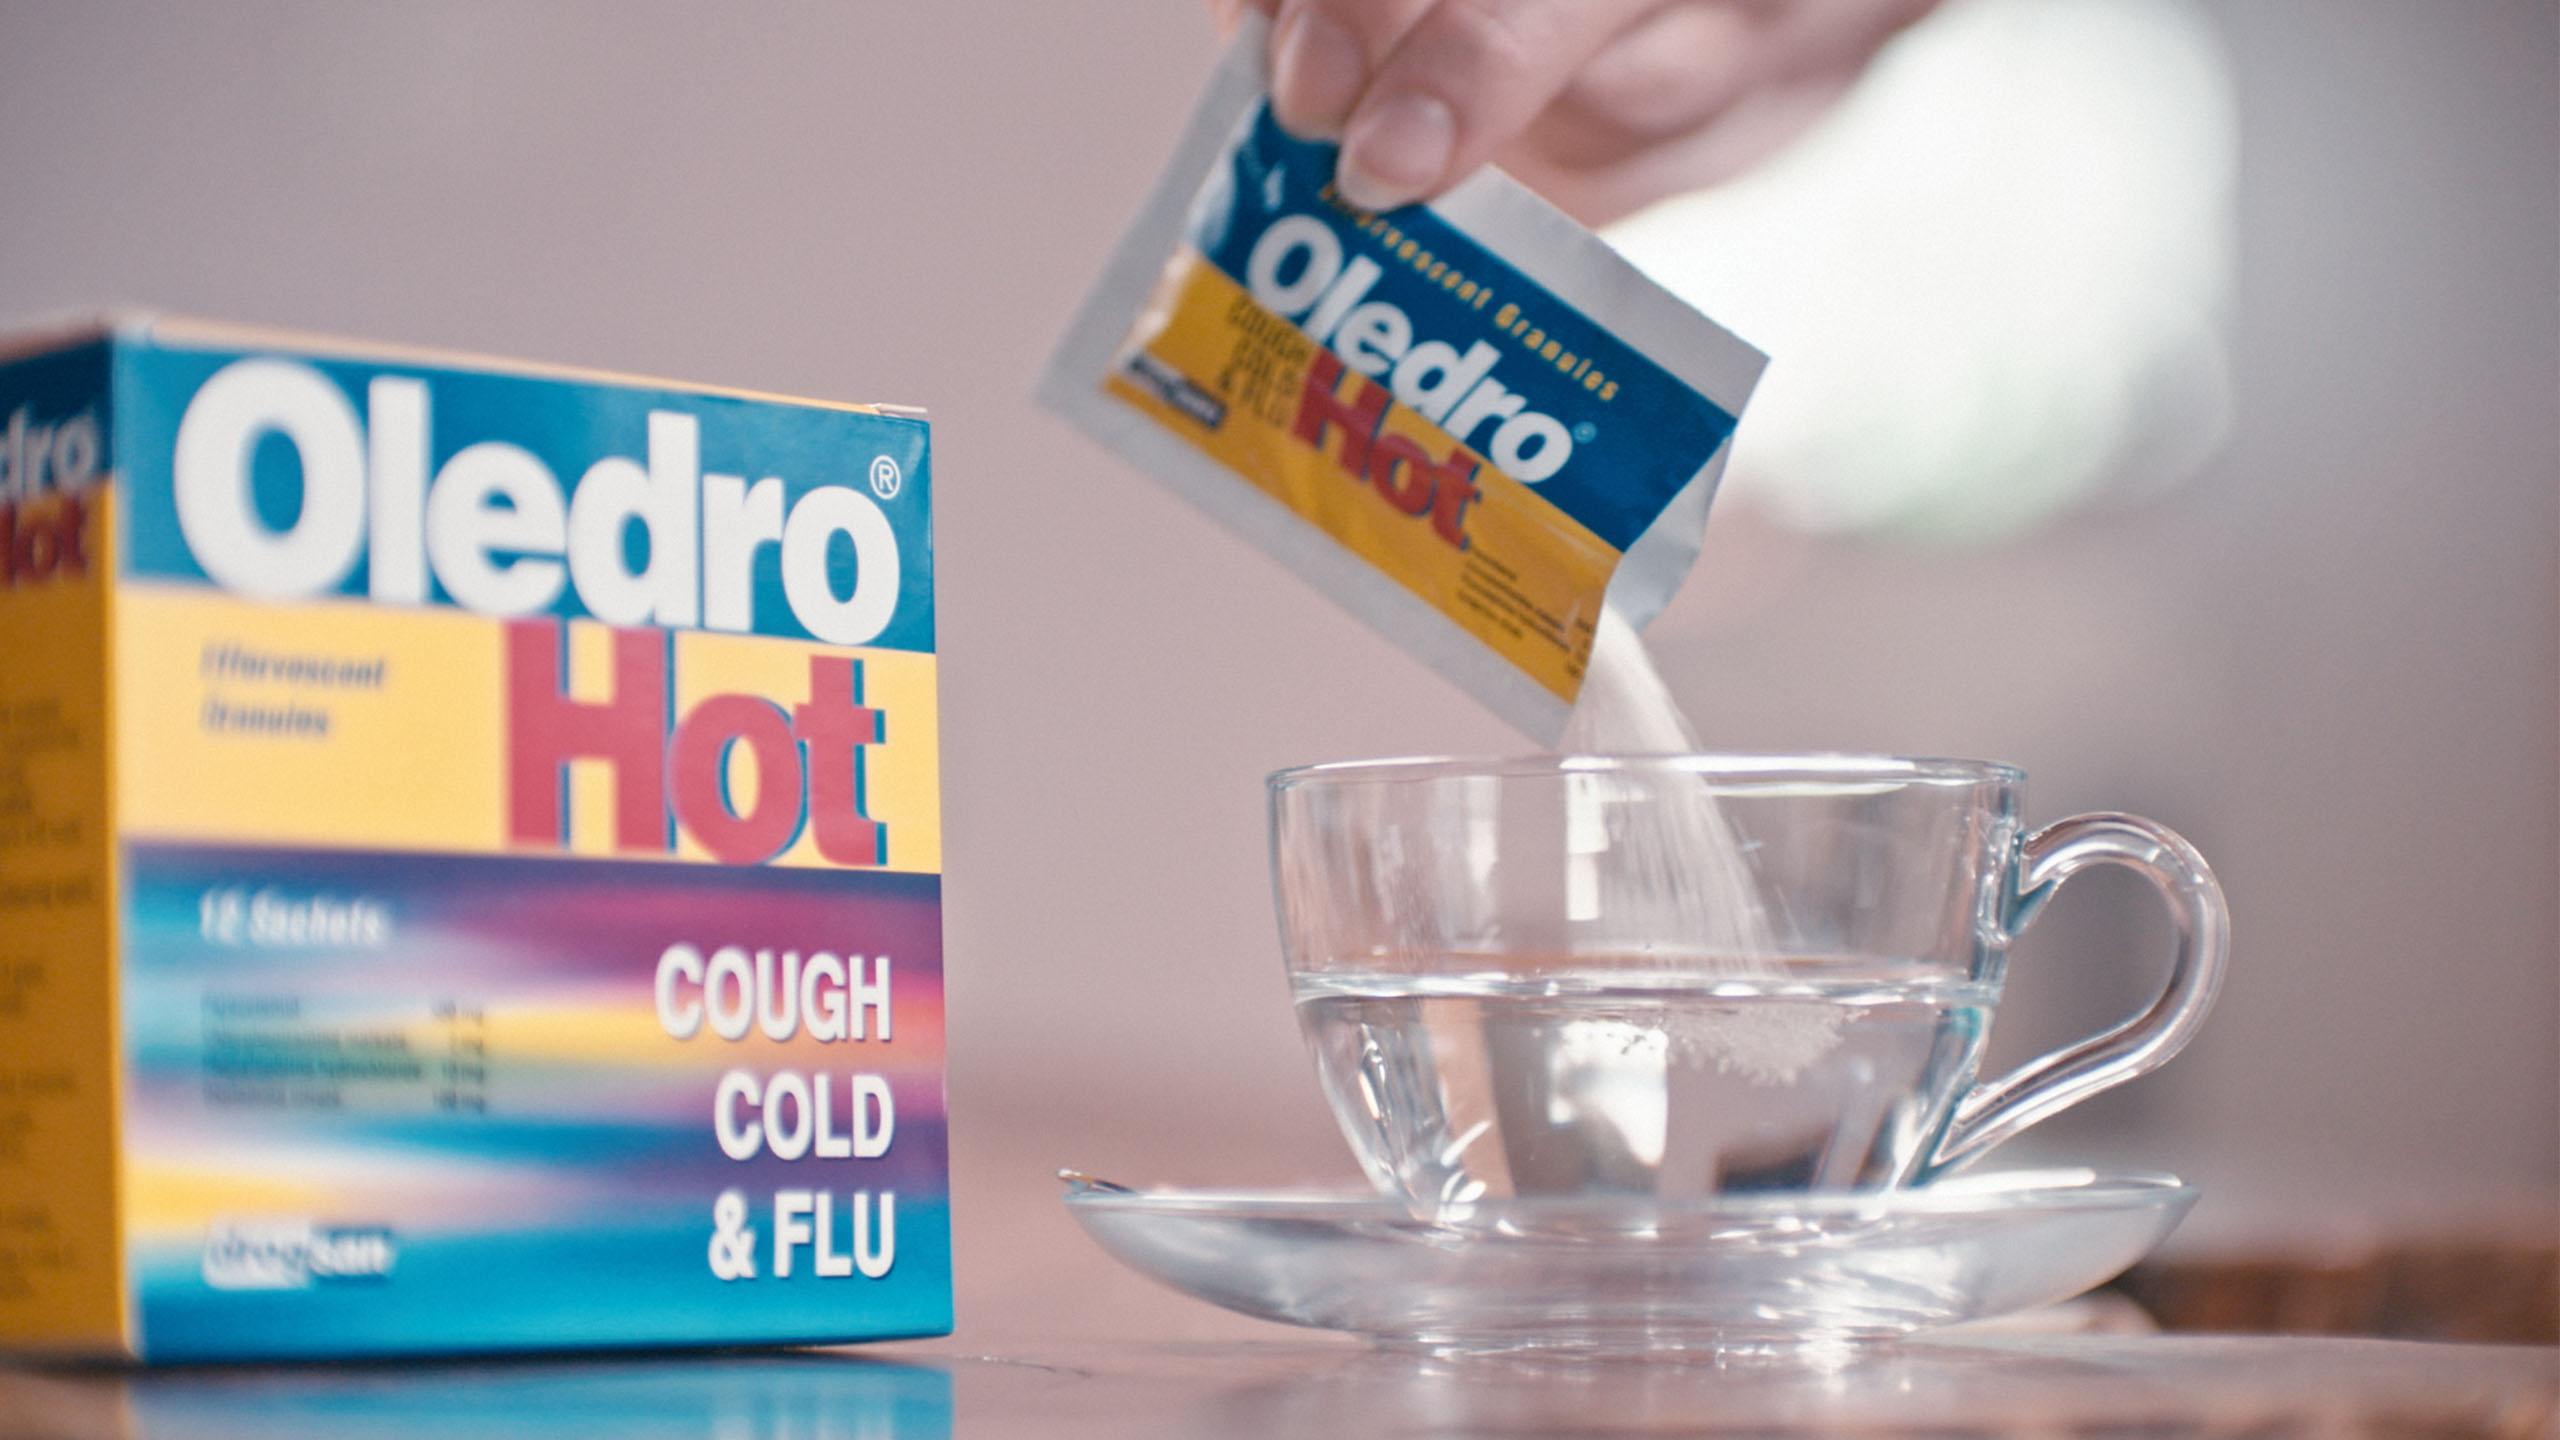 Oledro Hot Project Img 1 - Vatra Agency / Founder & CEO Gerton Bejo